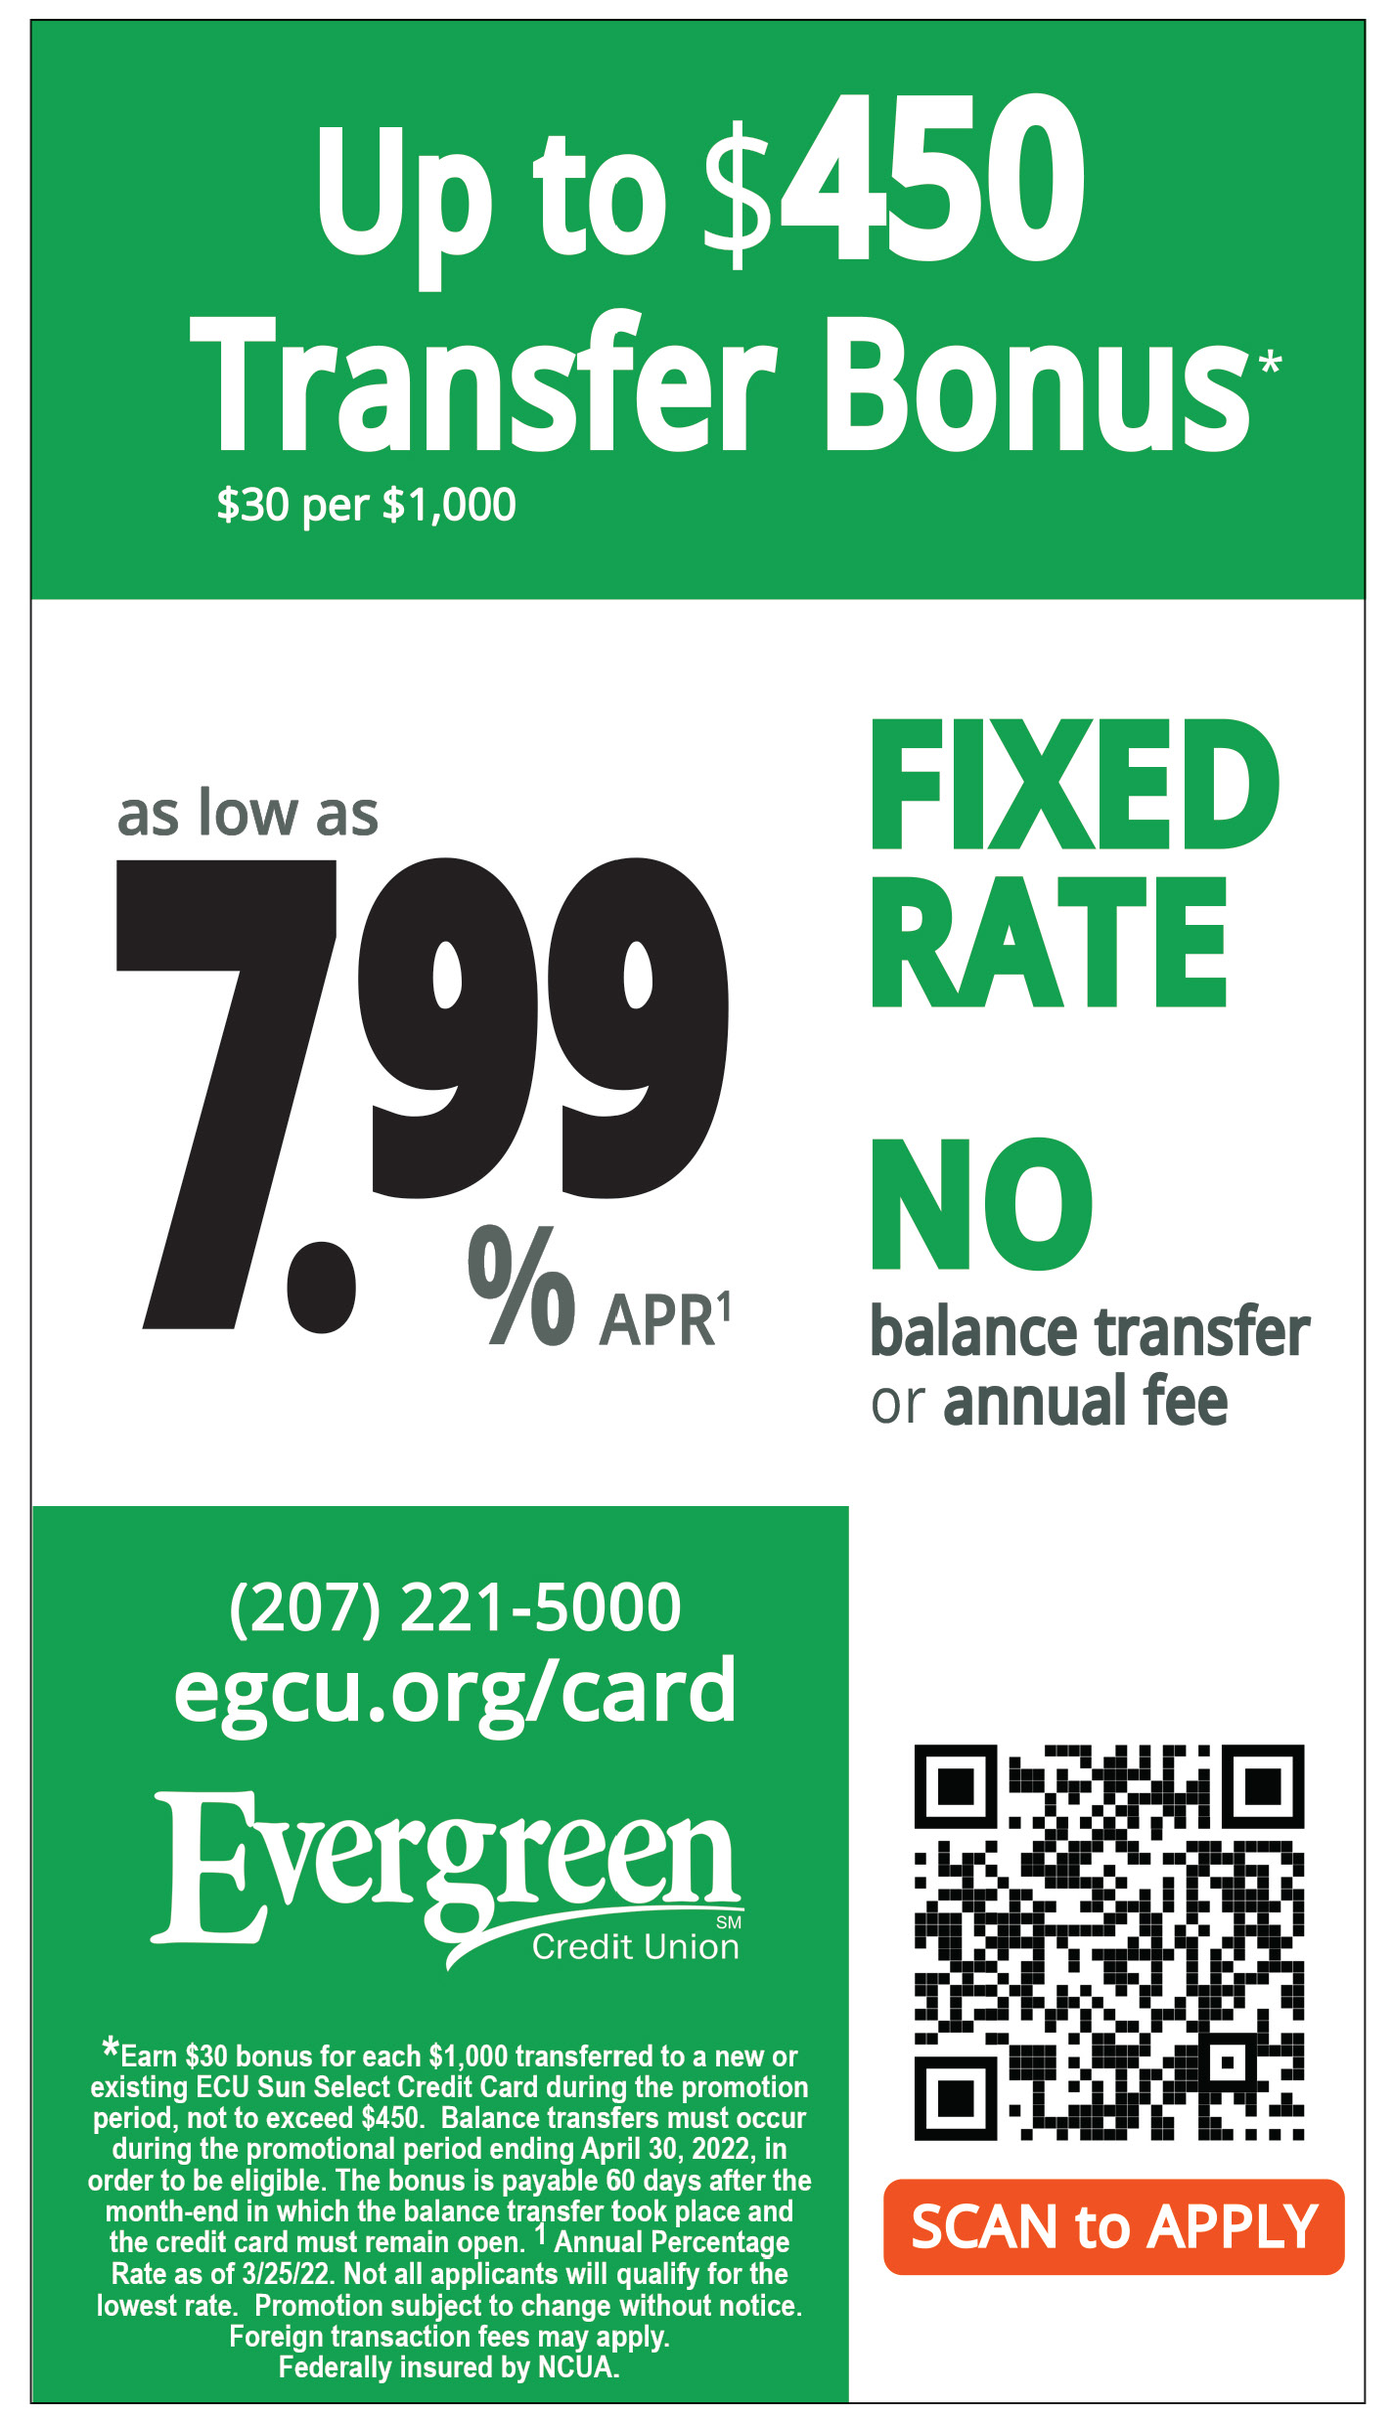 https://www.egcu.org/card